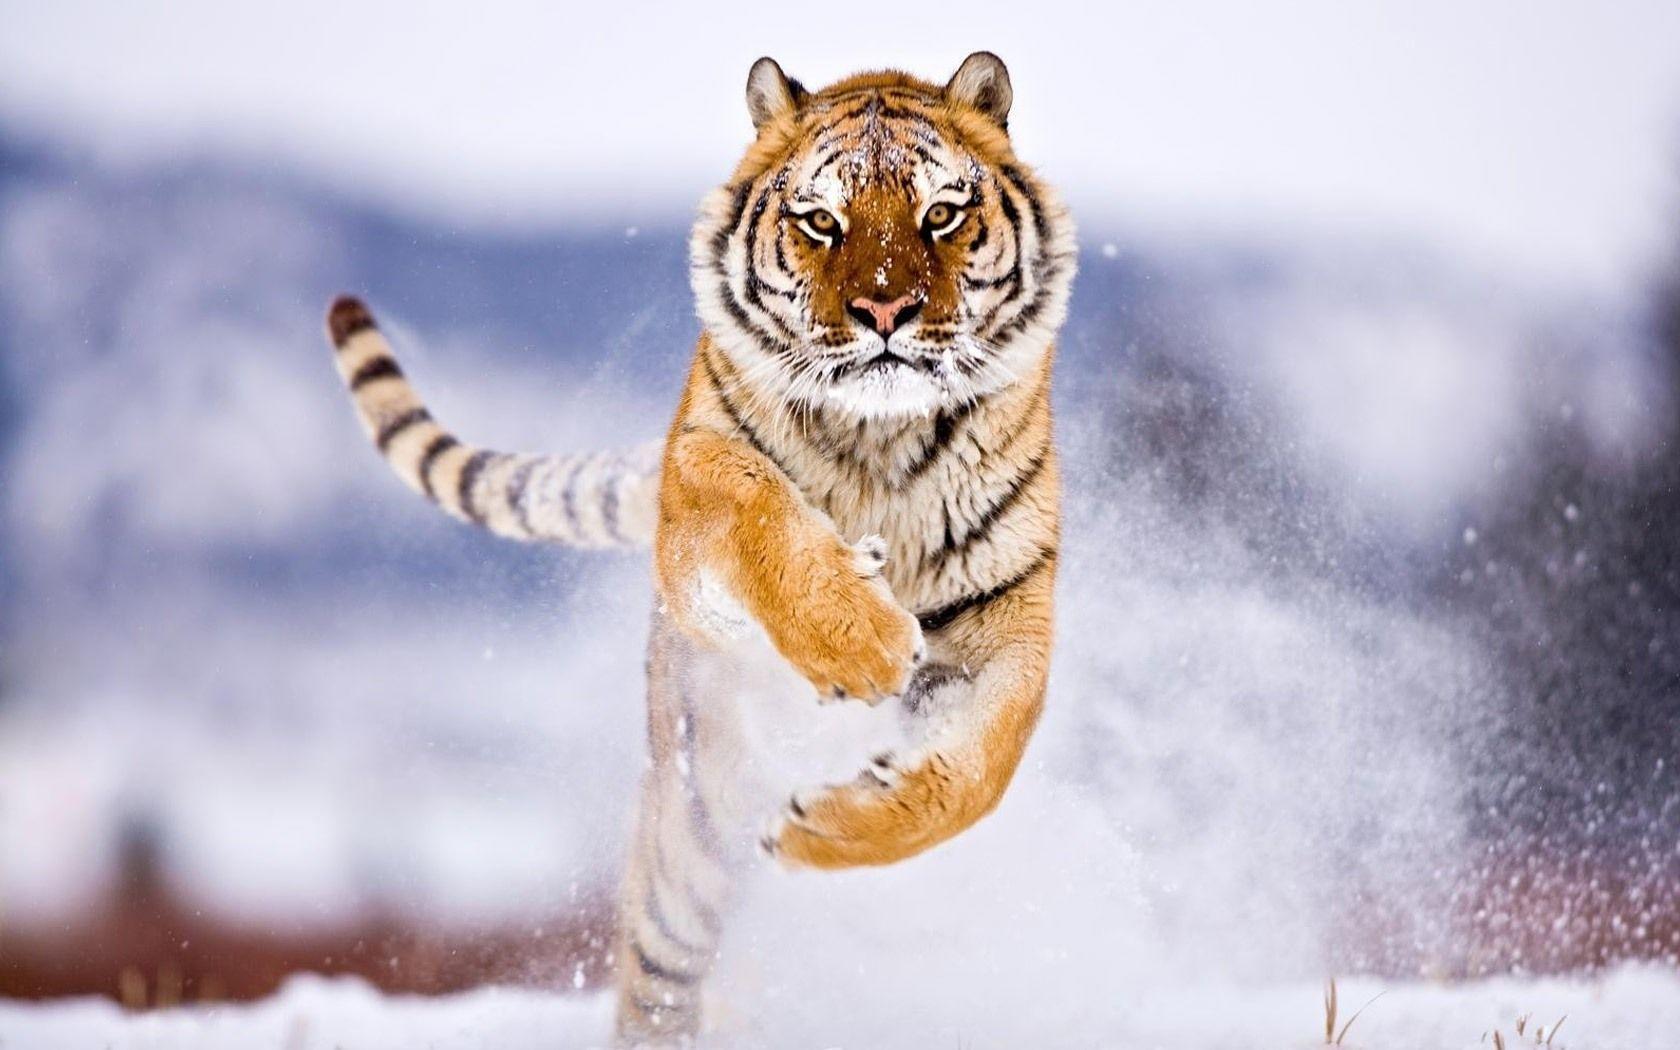 Tiger Wallpaper | Latest Hd Wallpapers